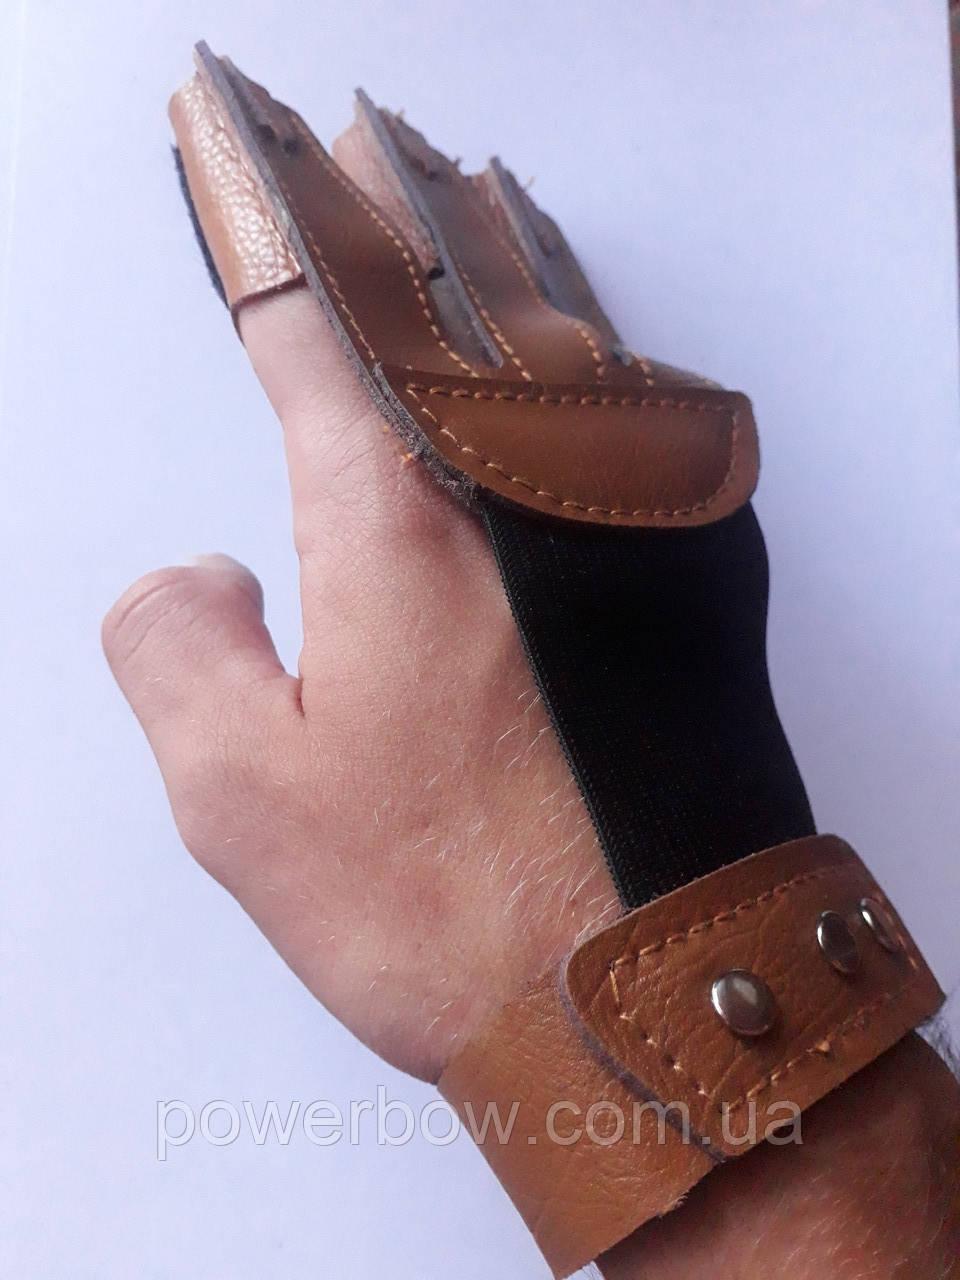 Перчатка для лука универсальная